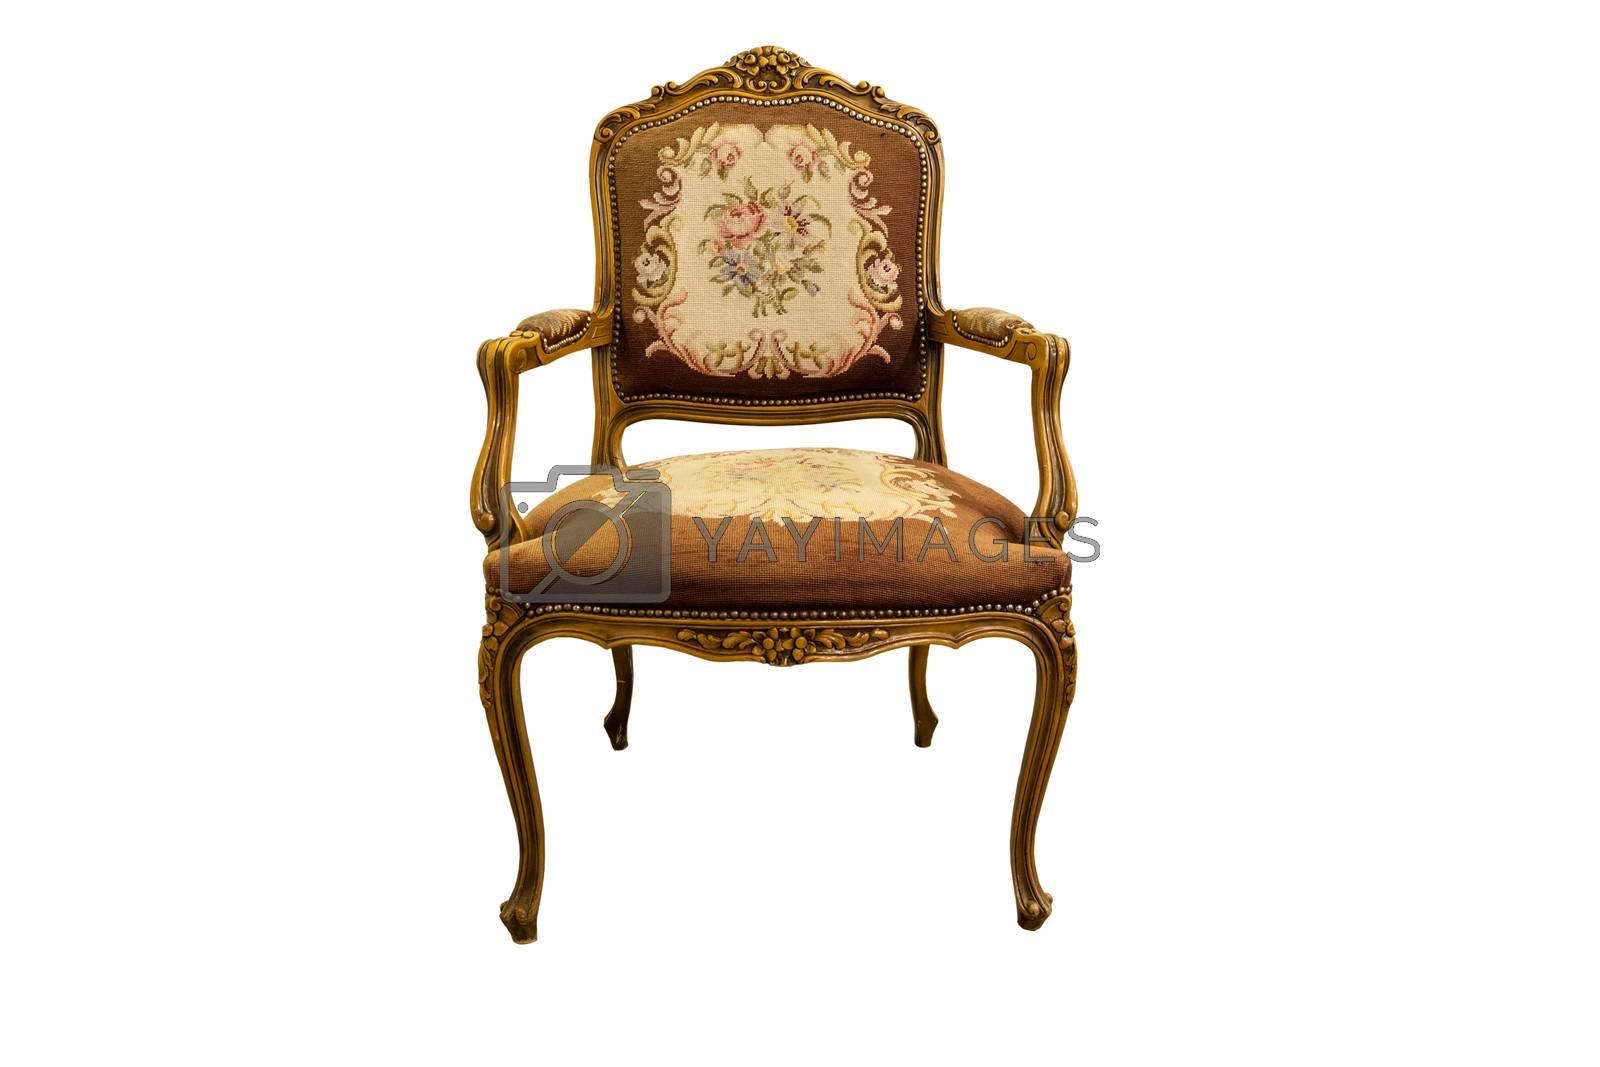 Antique chair by Nikonas